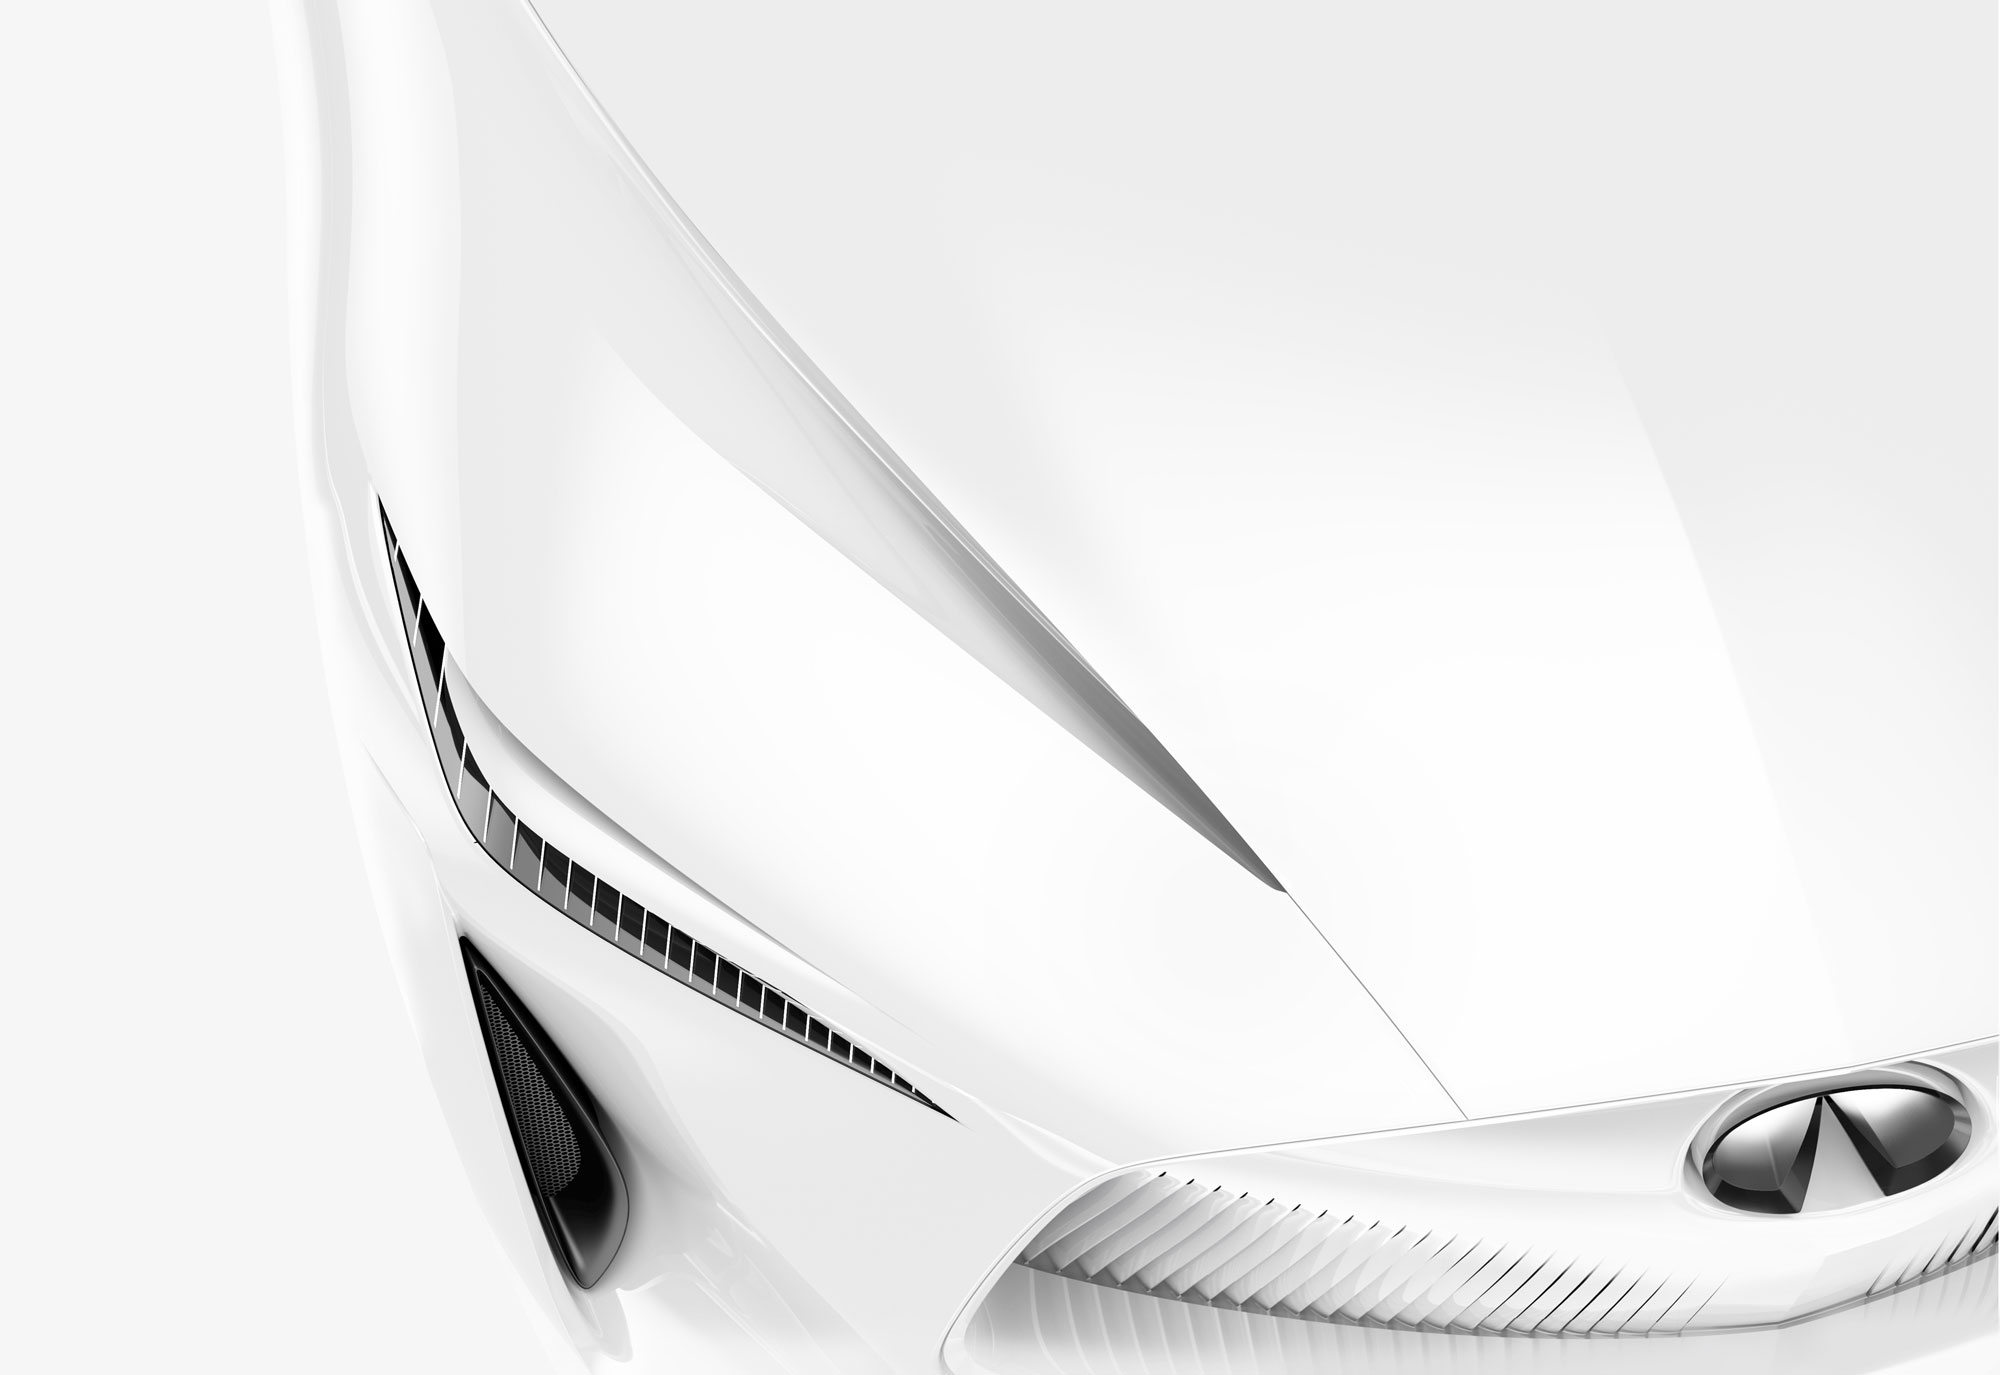 INFINITI_NAIAS_2018_Concept-Car_21-Dec_2017_4k.jpg